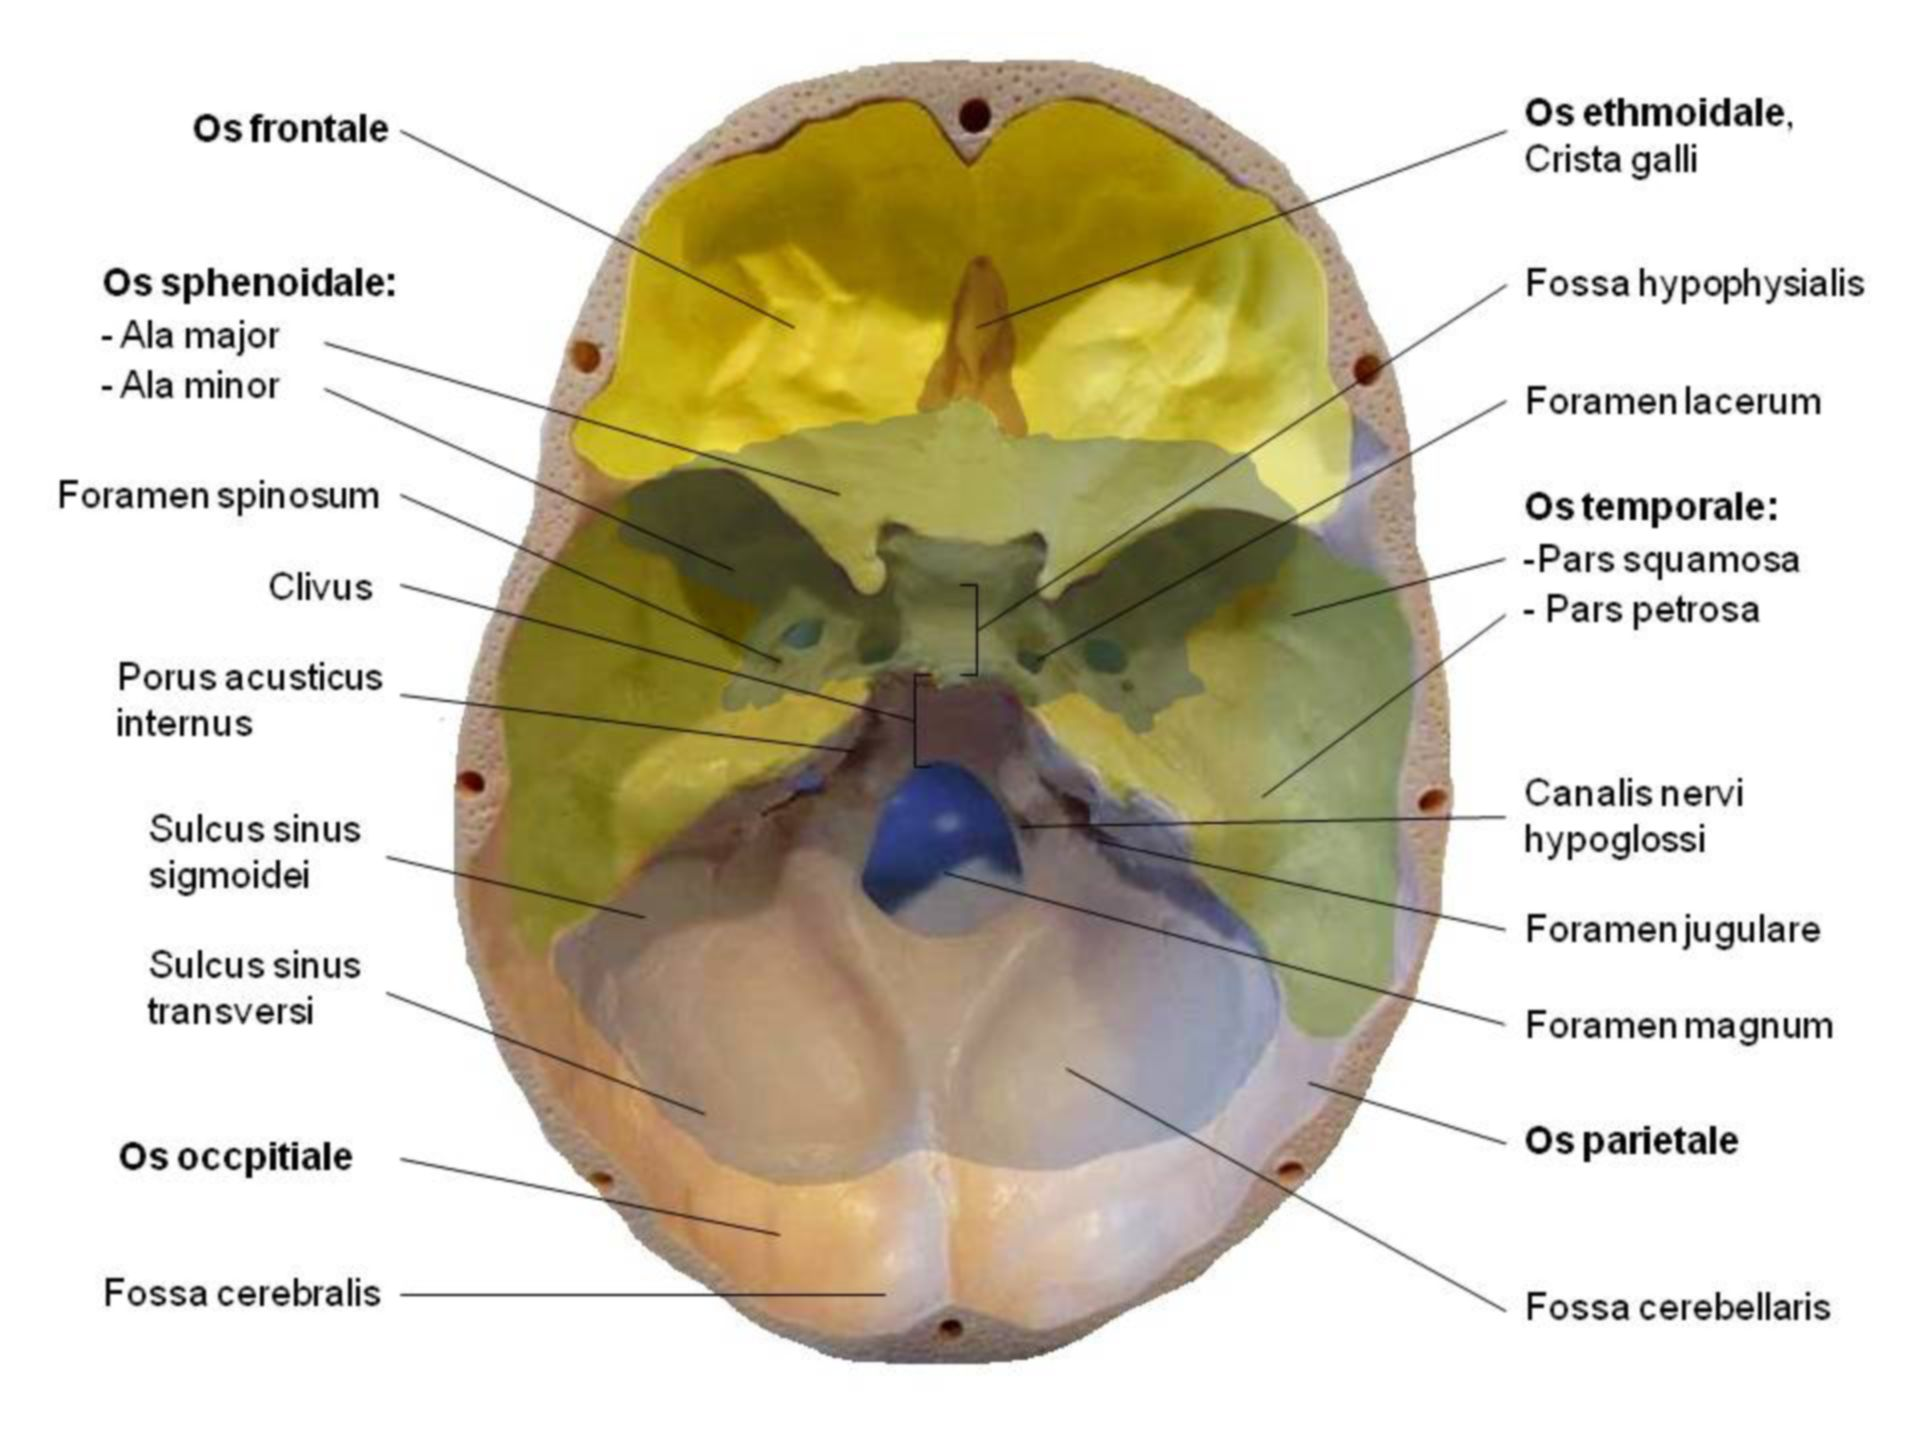 Schädel - Basis cranii interna - beschriftet